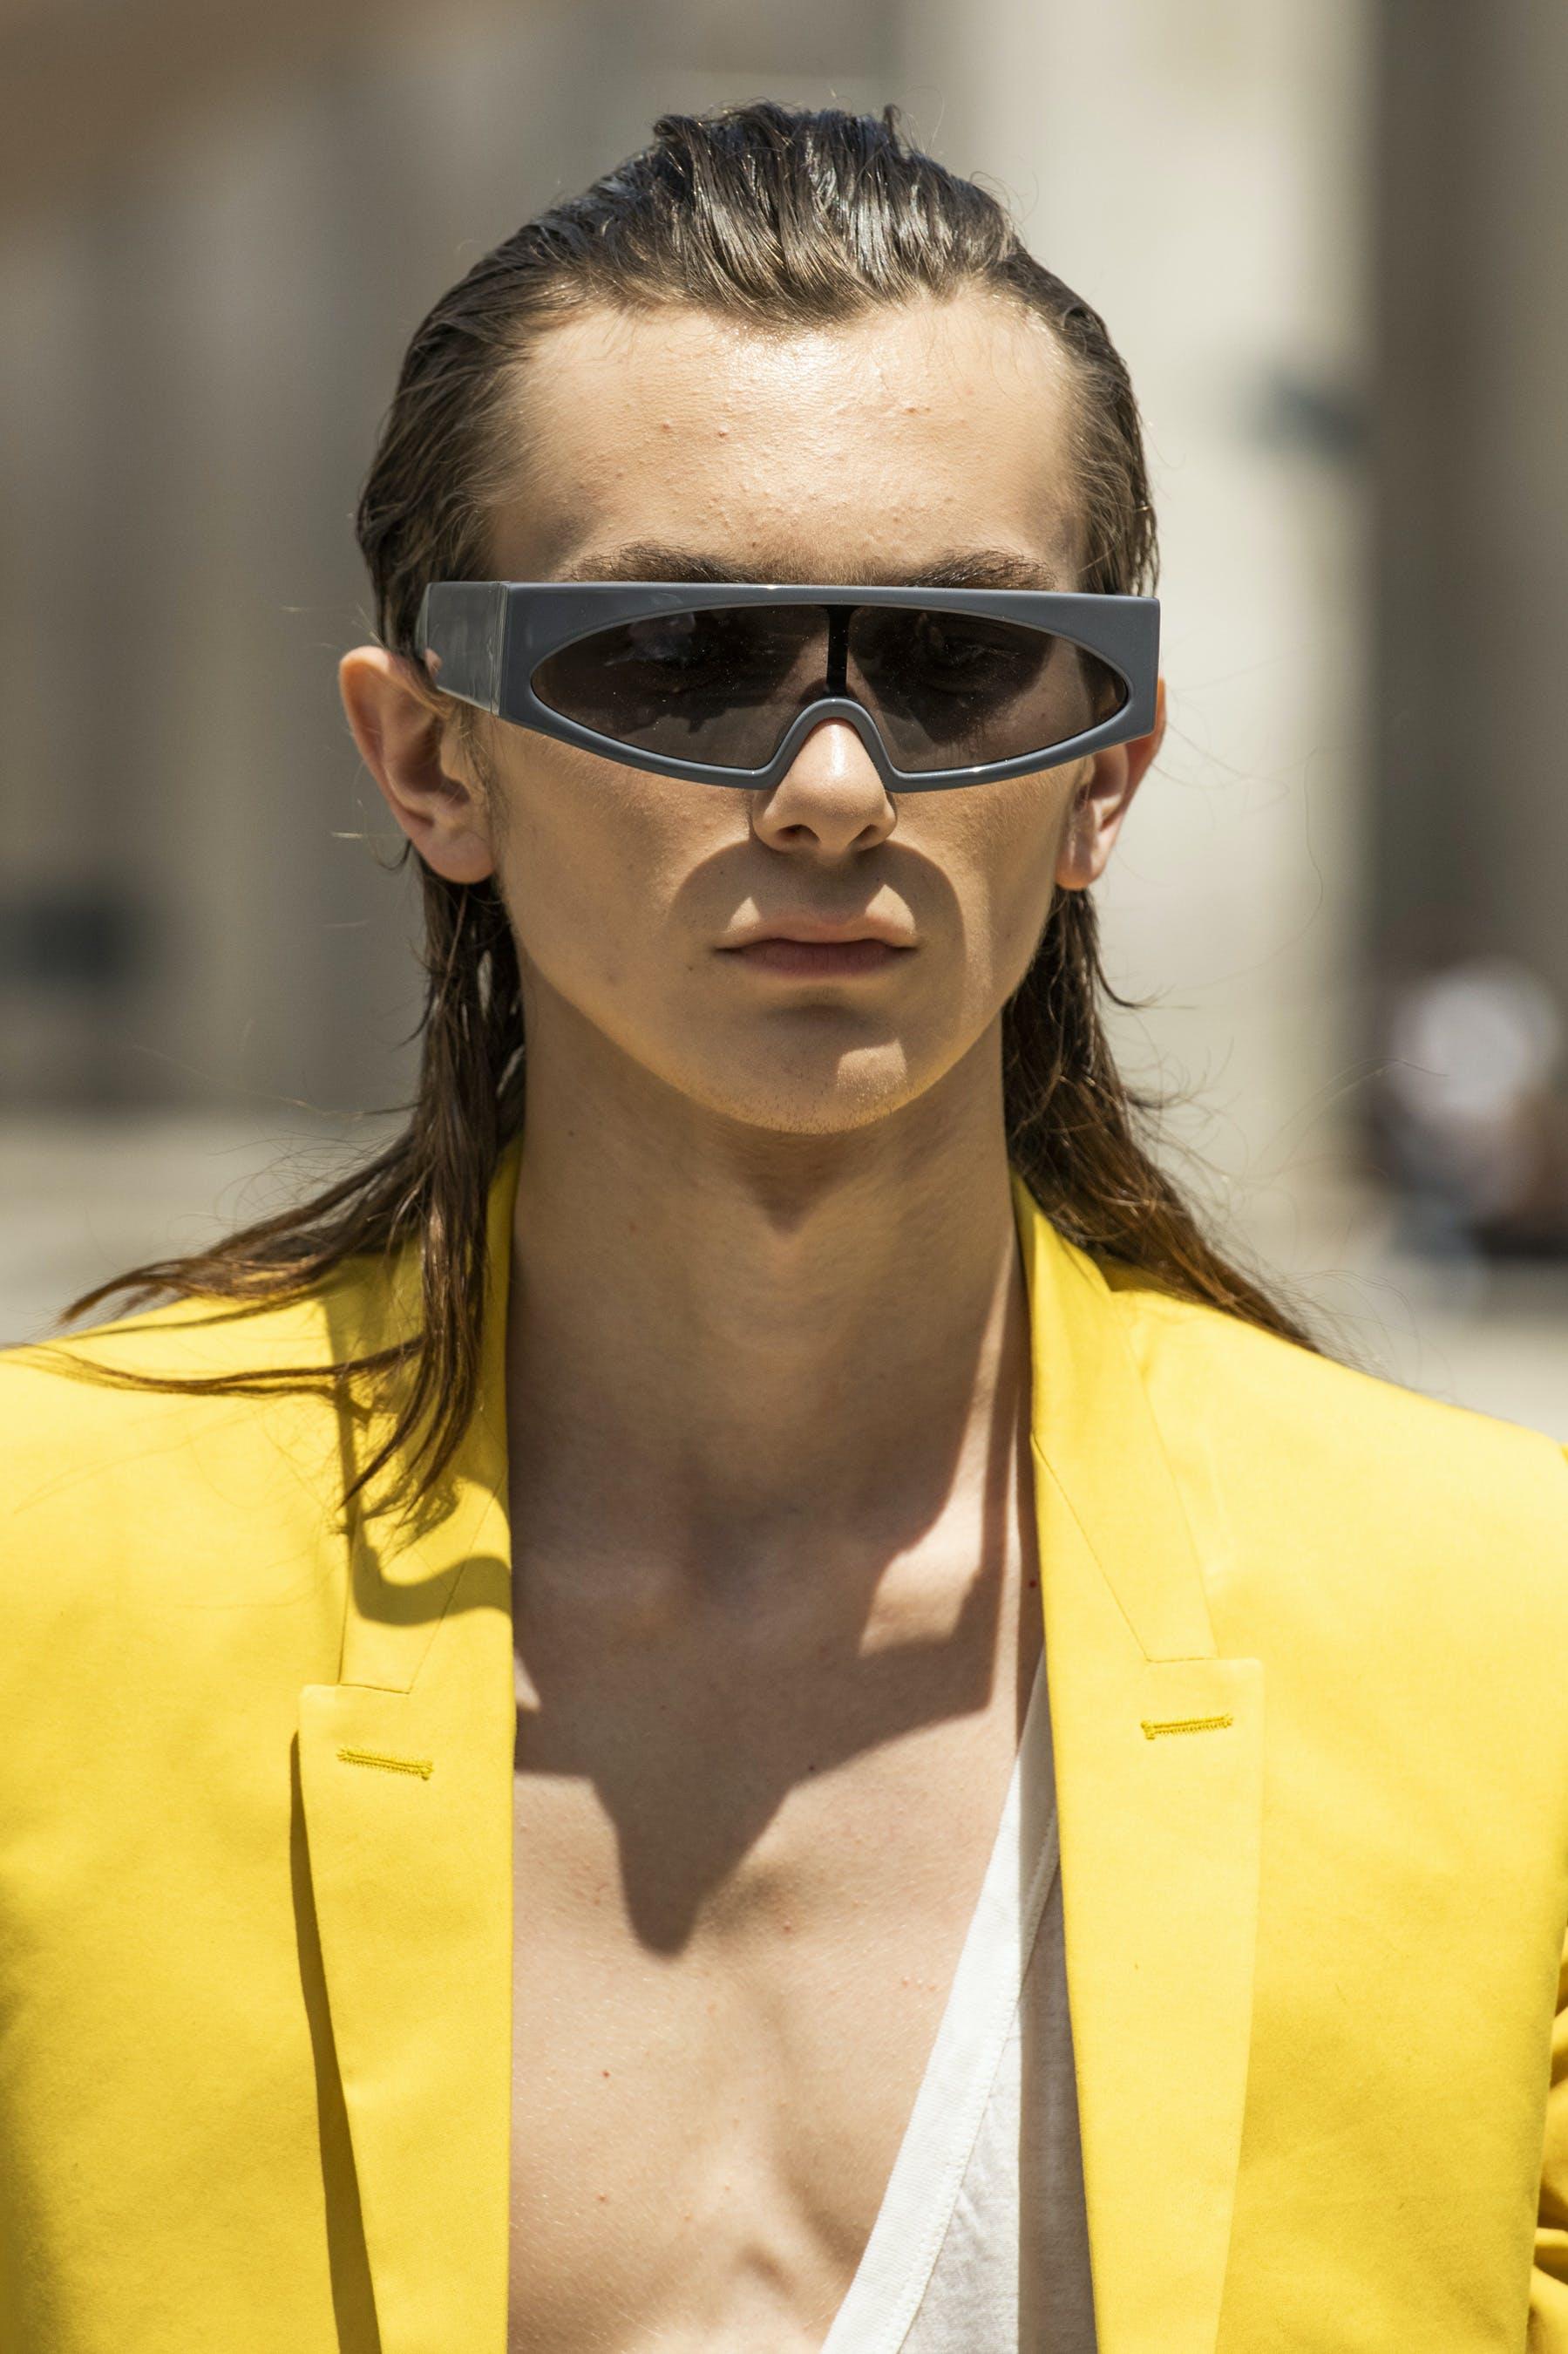 Rick Owens Runway Details Retro Futuristic Grey Rectangular Framed Sunglasses Tatlin Blazer In Lemon Yellow Mens SS20 Tecautl